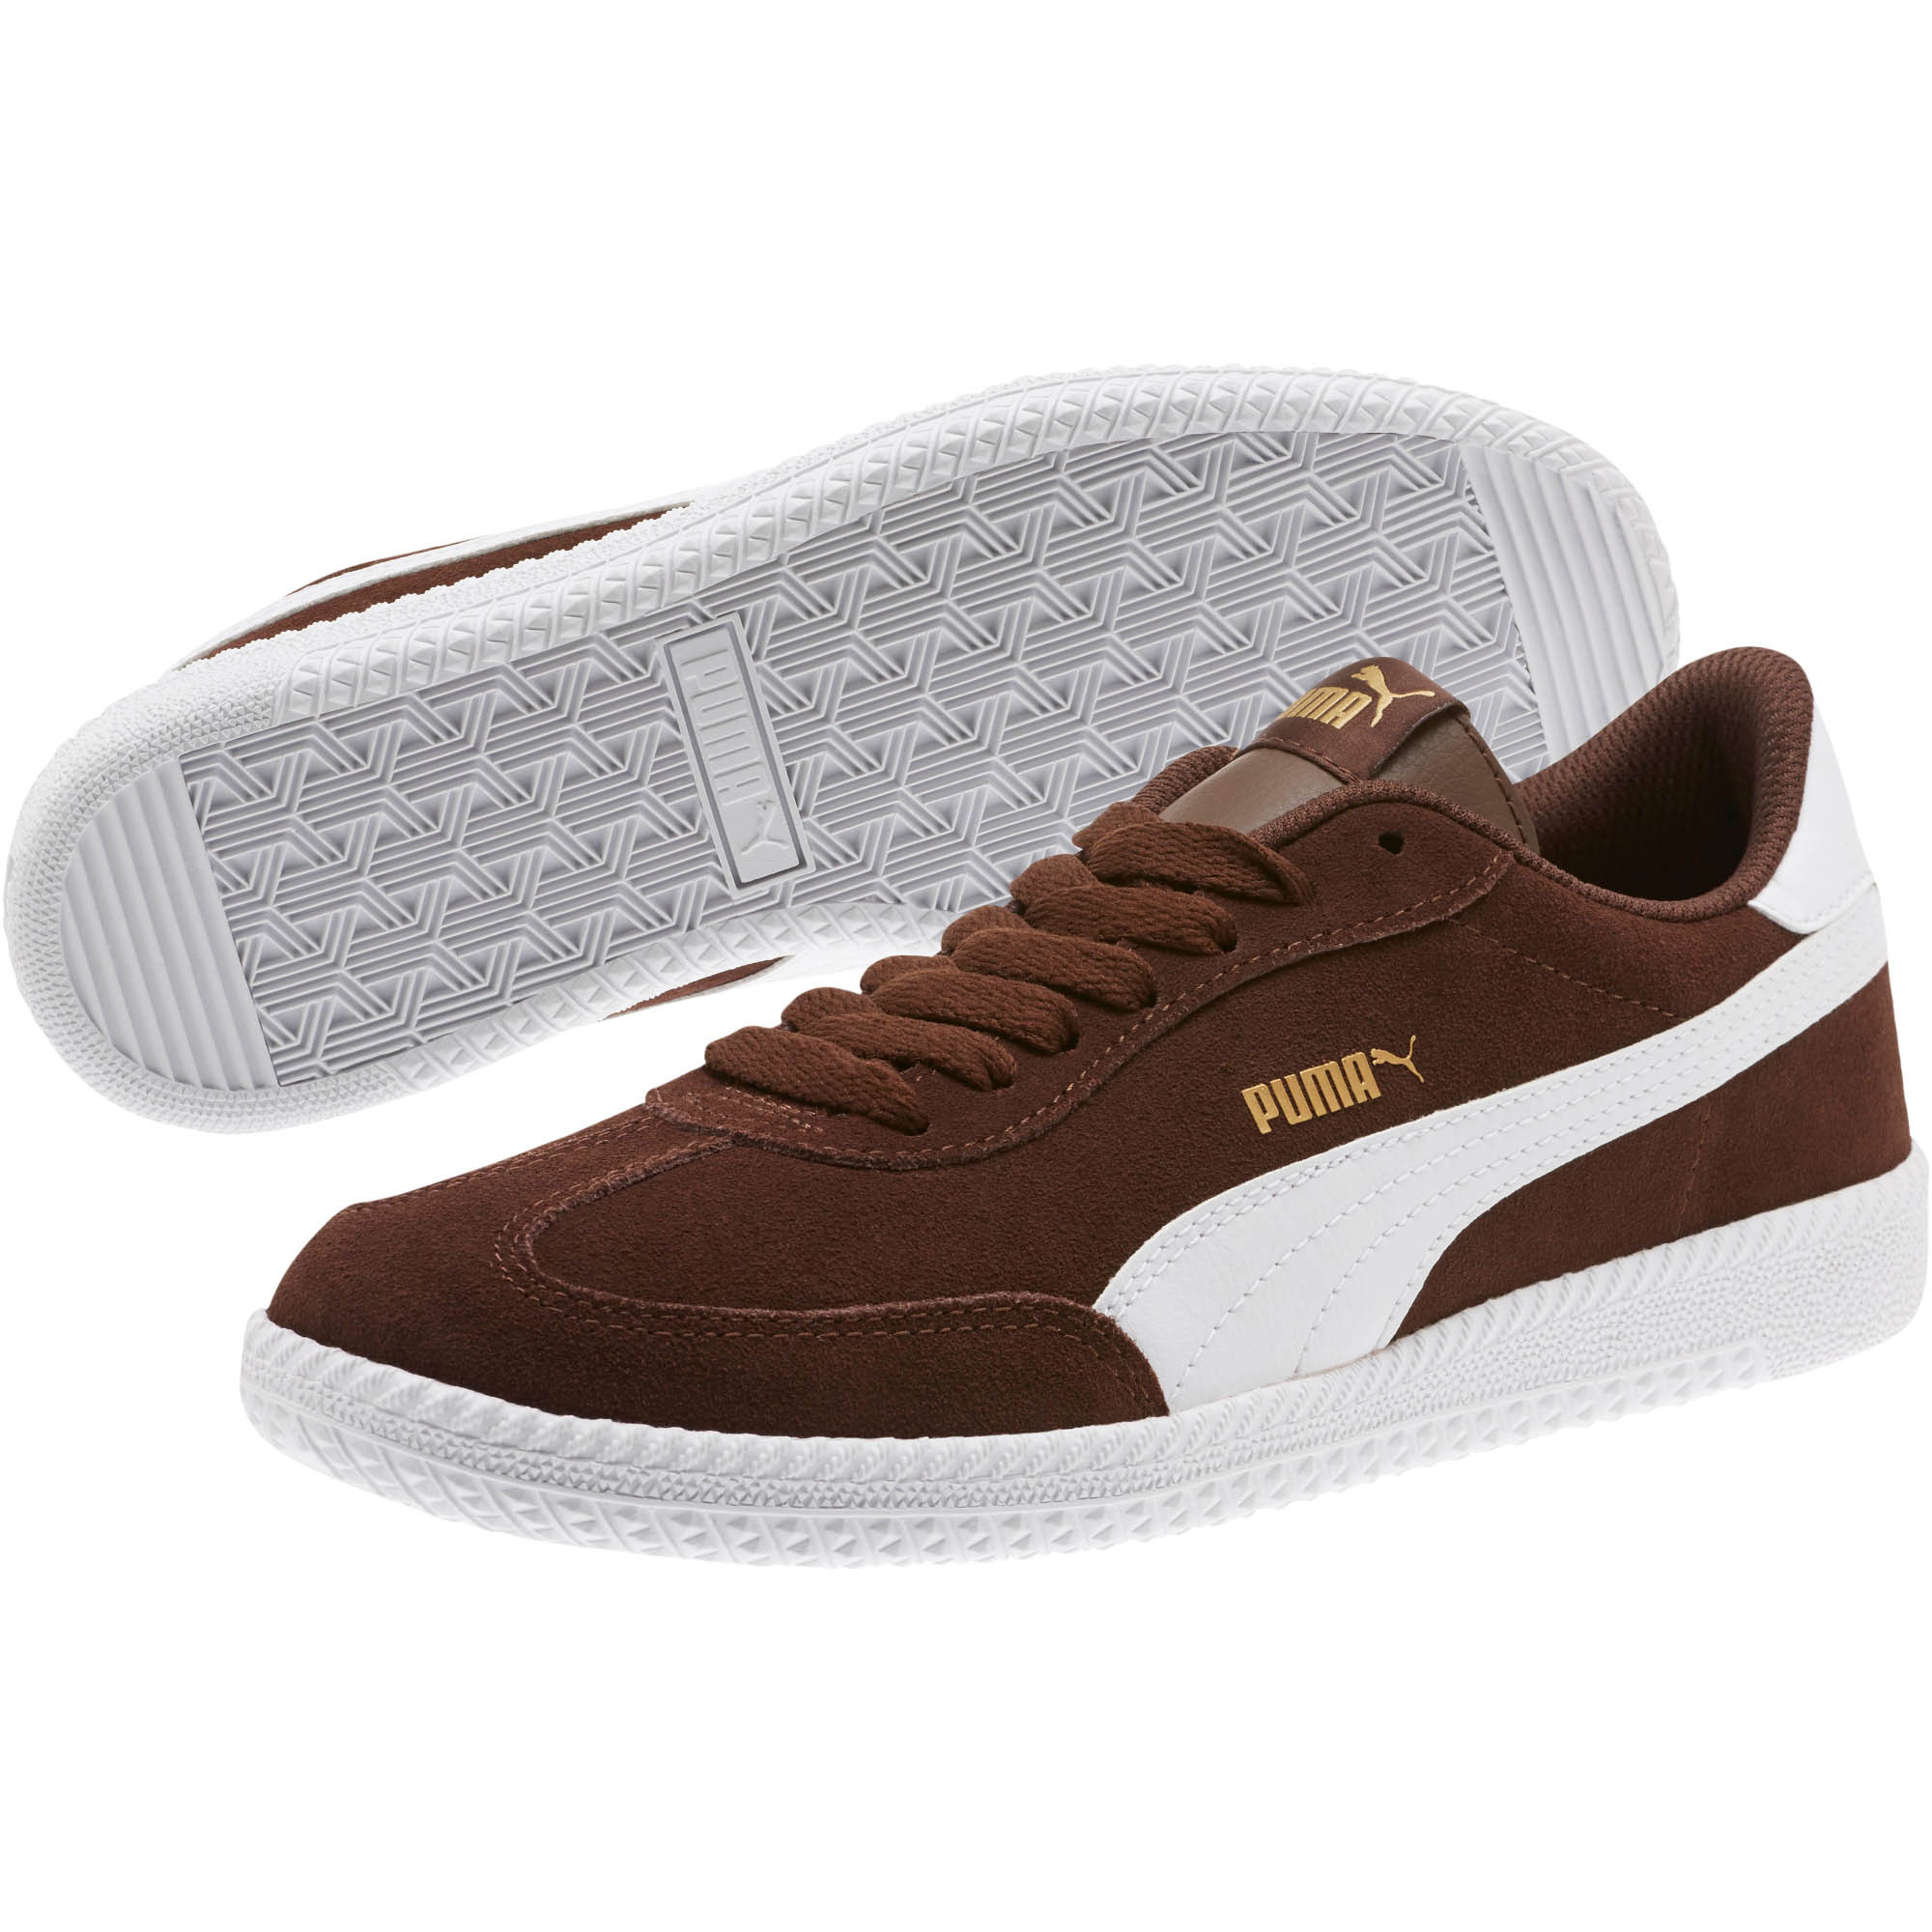 PUMA-Astro-Cup-Suede-Sneakers-Men-Shoe-Basics thumbnail 26